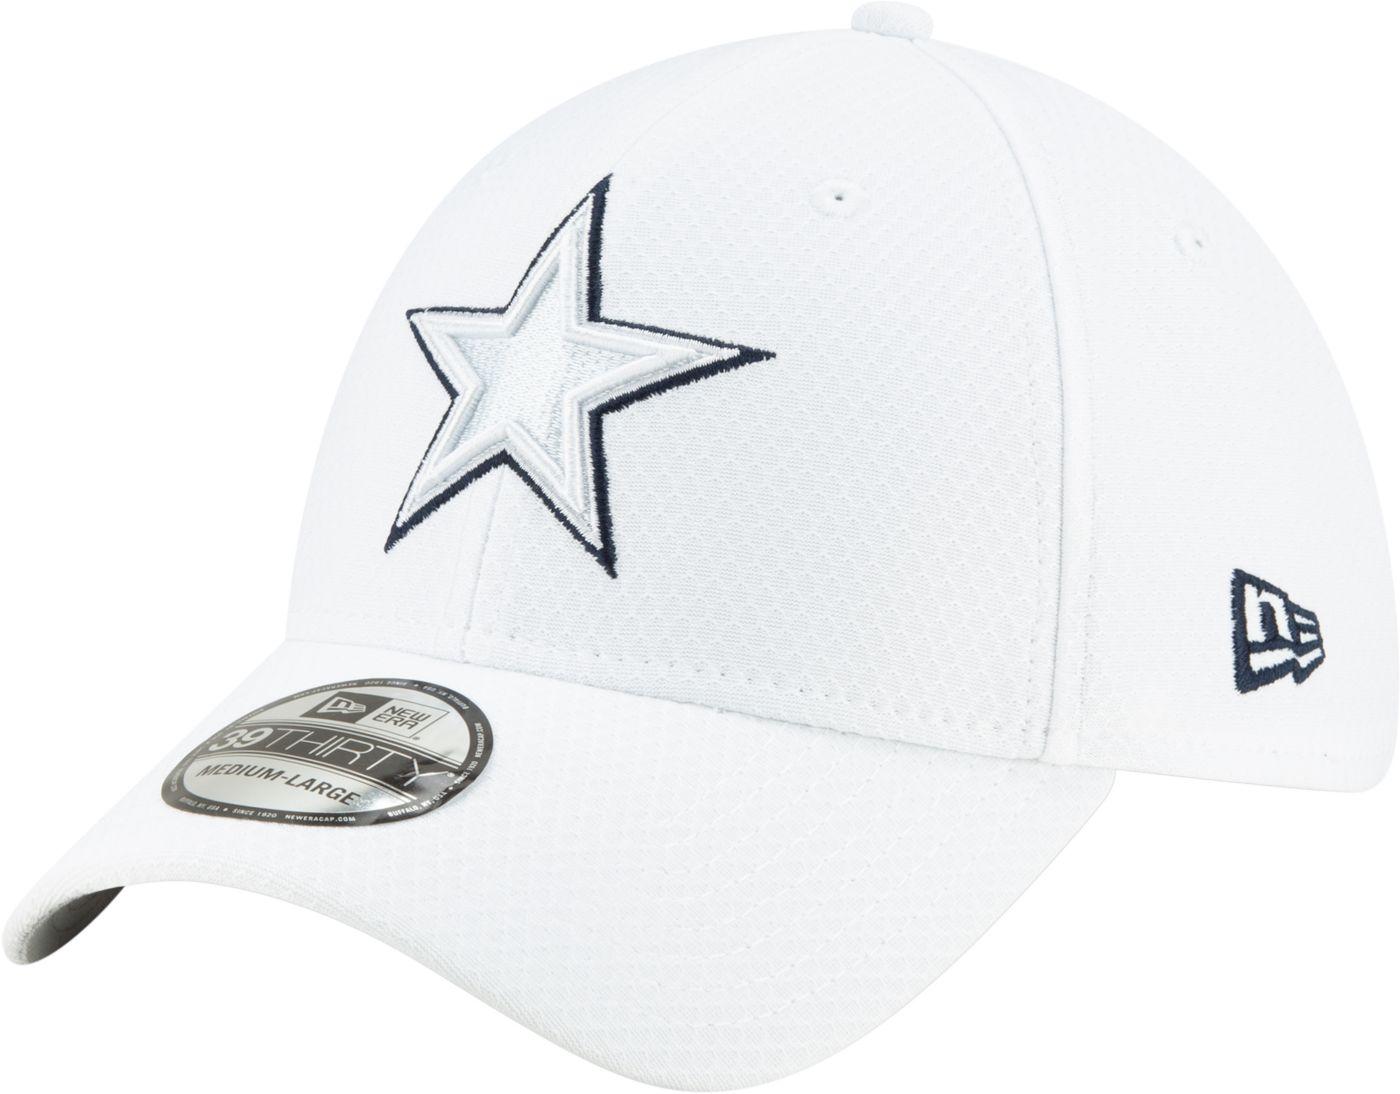 New Era Men's Dallas Cowboys Sideline 100th 39Thirty Stretch Fit White Hat